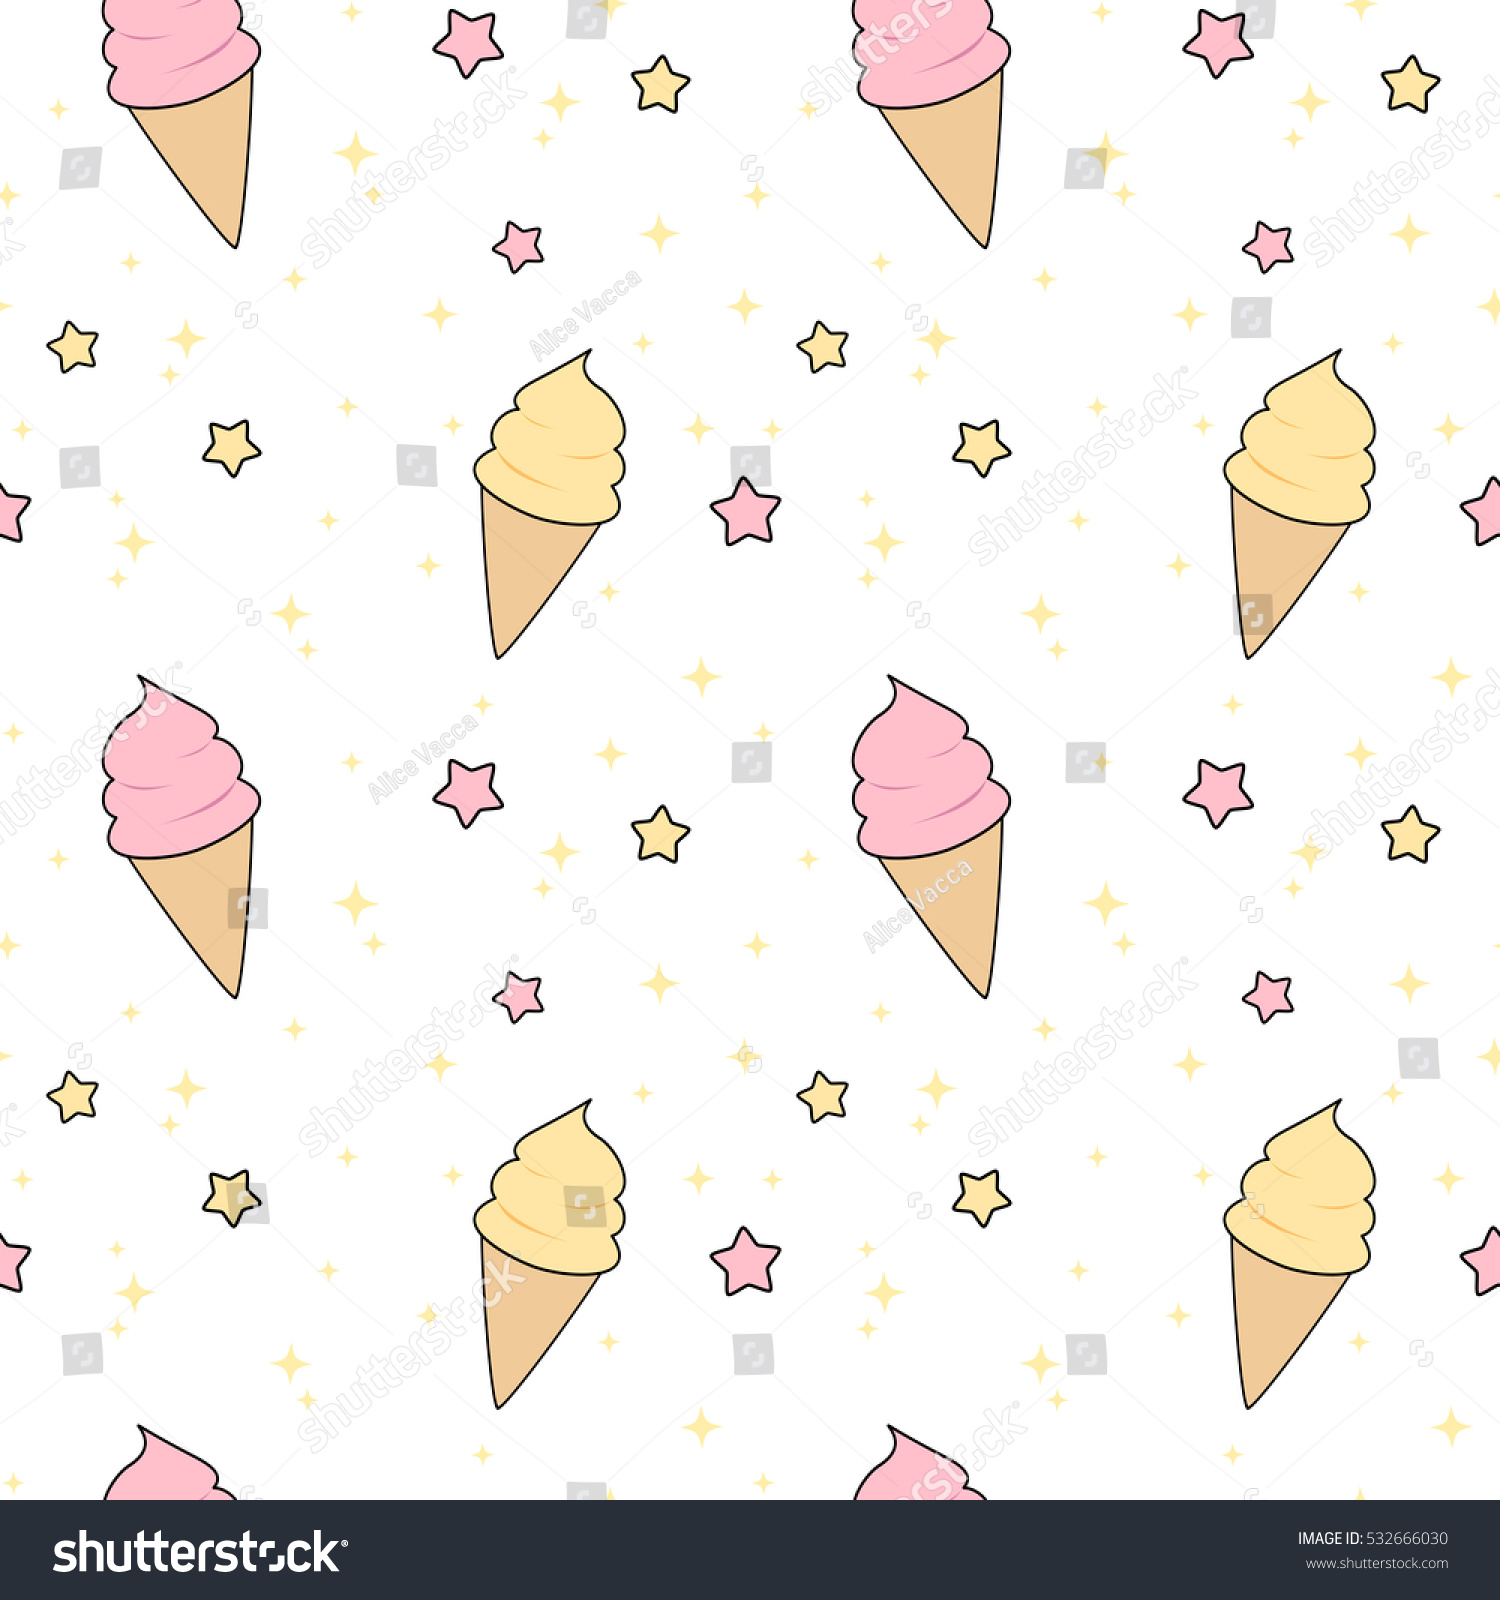 Cute Colorful Ice Cream Seamless Pattern Background: Cute Pink Yellow Cartoon Ice Cream Stock Vector 532666030